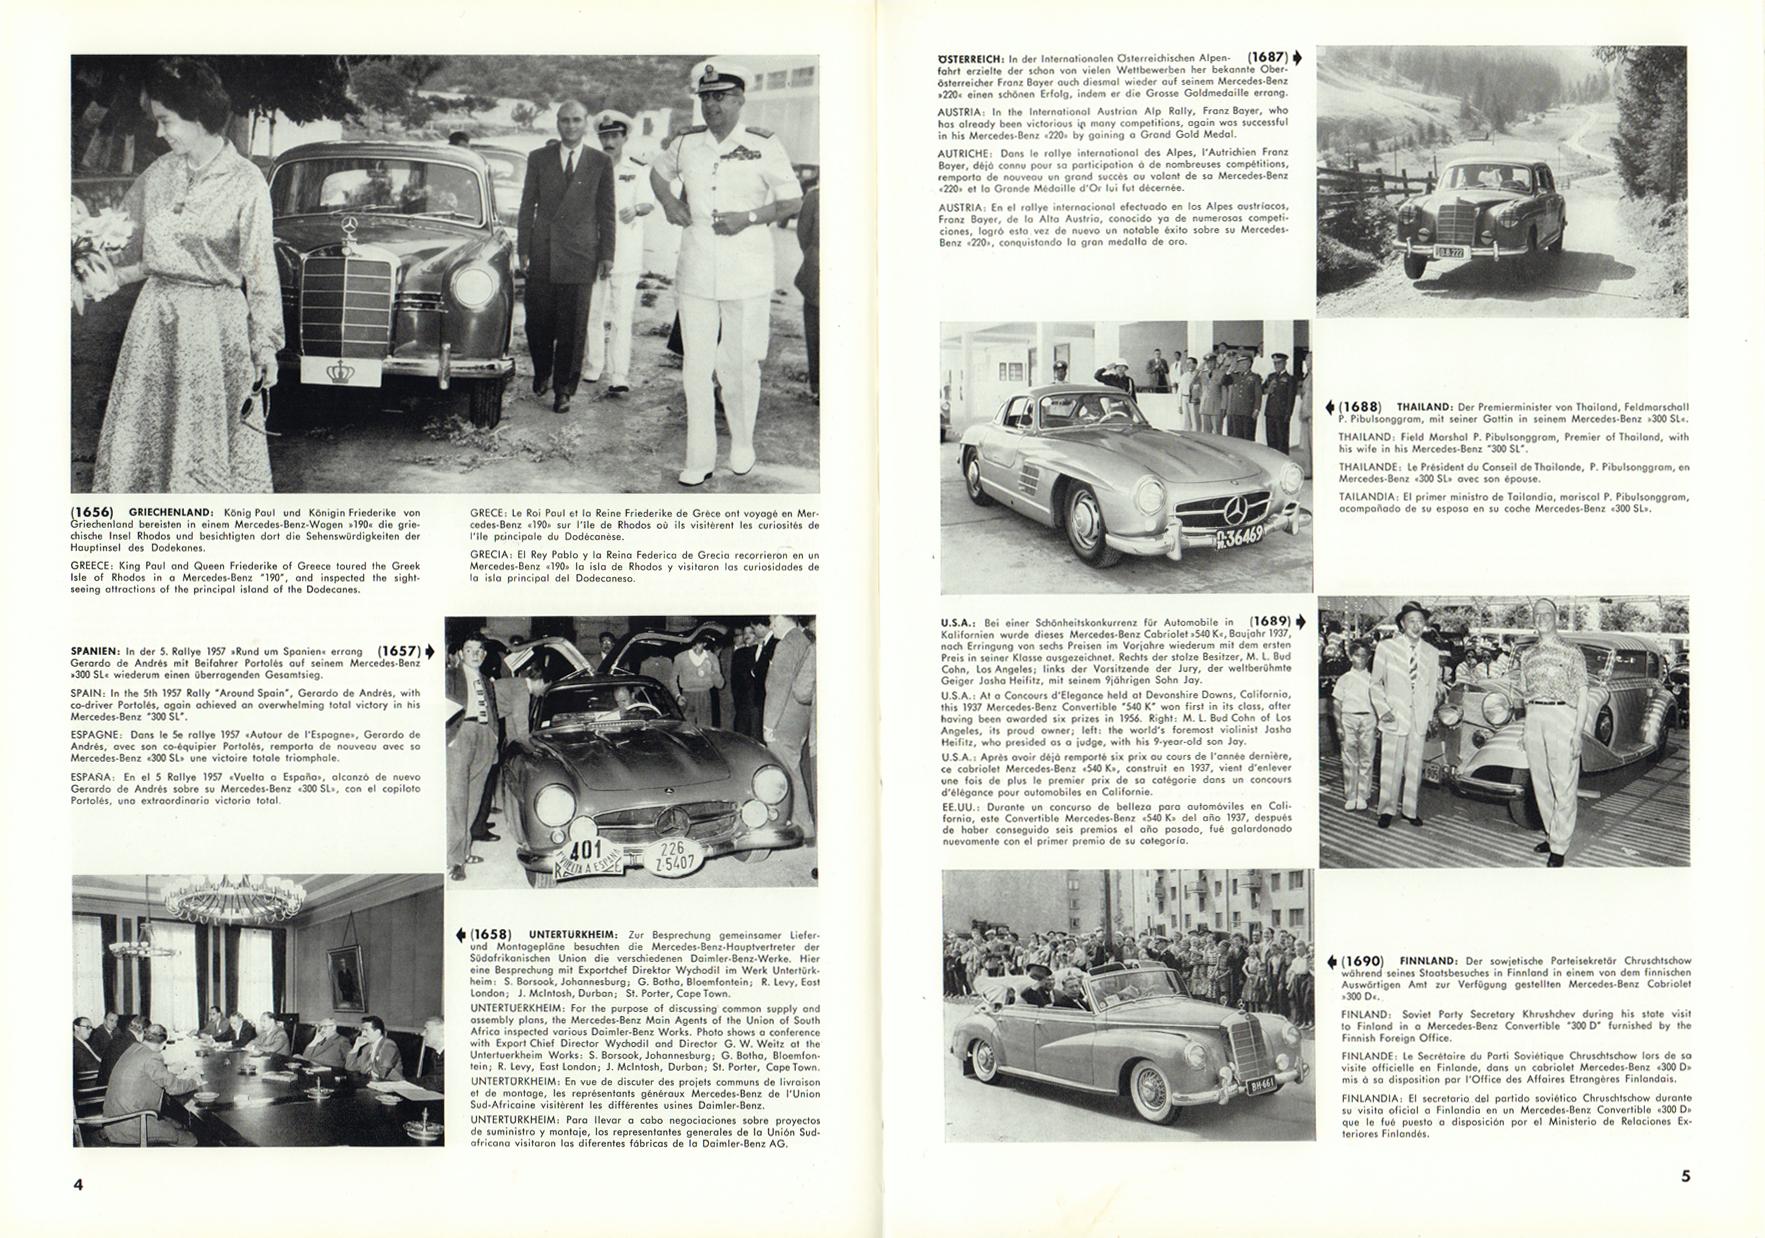 (REVISTA): Periódico In aller welt n.º 12 - Mercedes-Benz no mundo - 1957 - multilingue 003